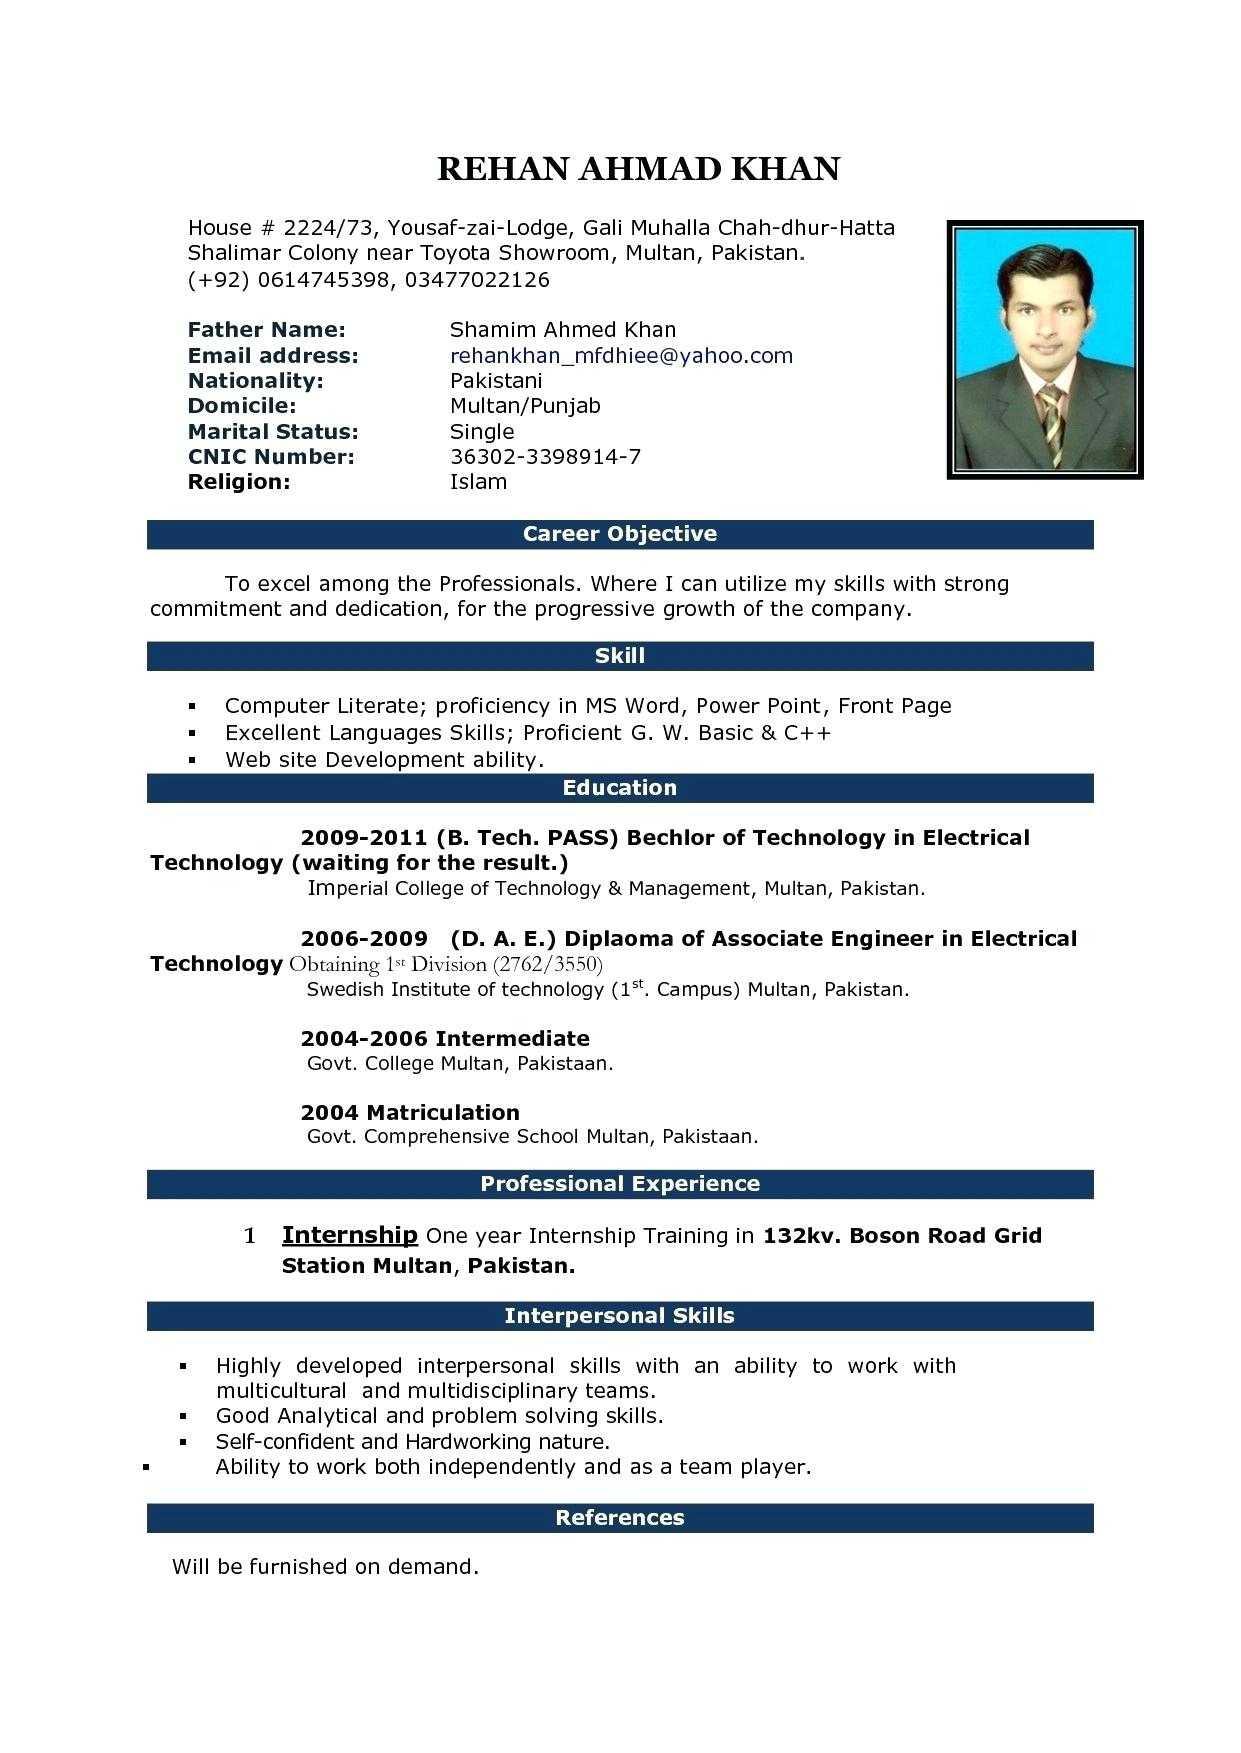 Resume: Resume Template On Microsoft Word 2010 Throughout Resume Templates Microsoft Word 2010